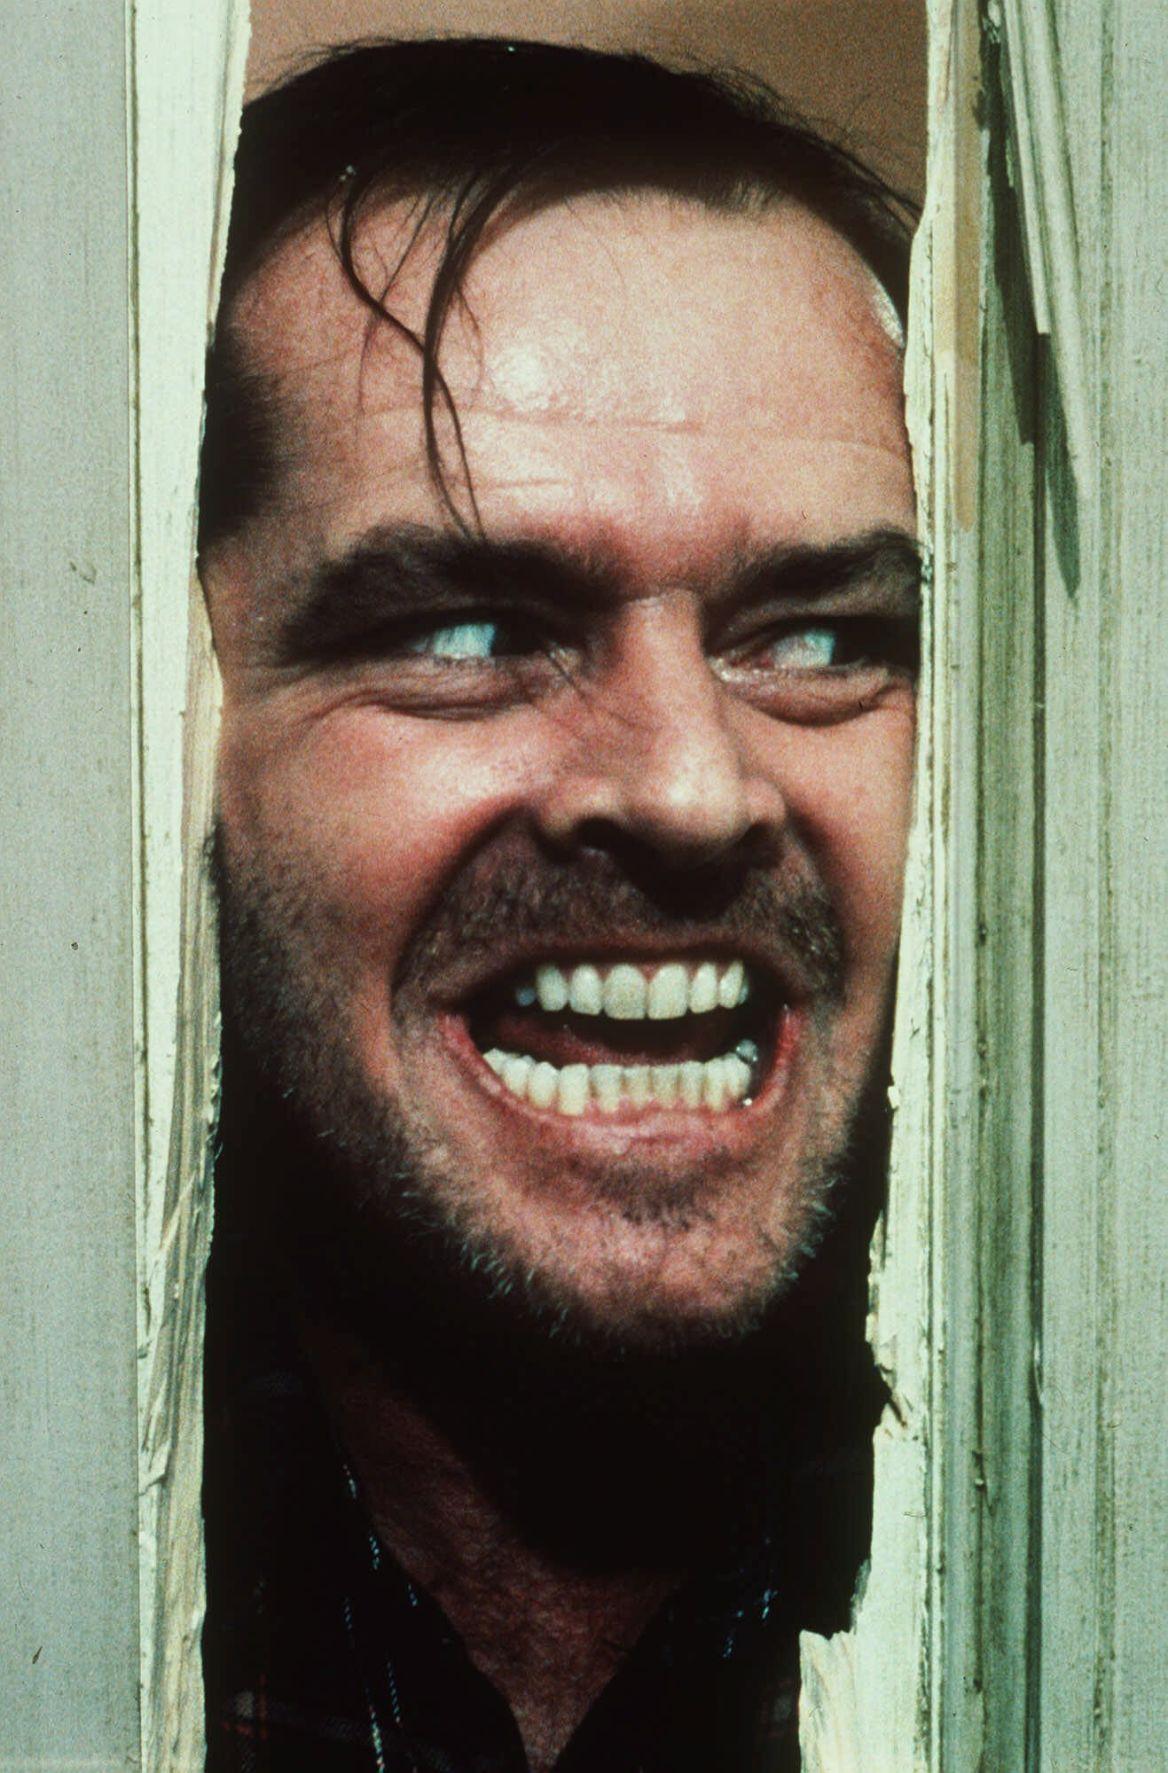 Shining scary movies